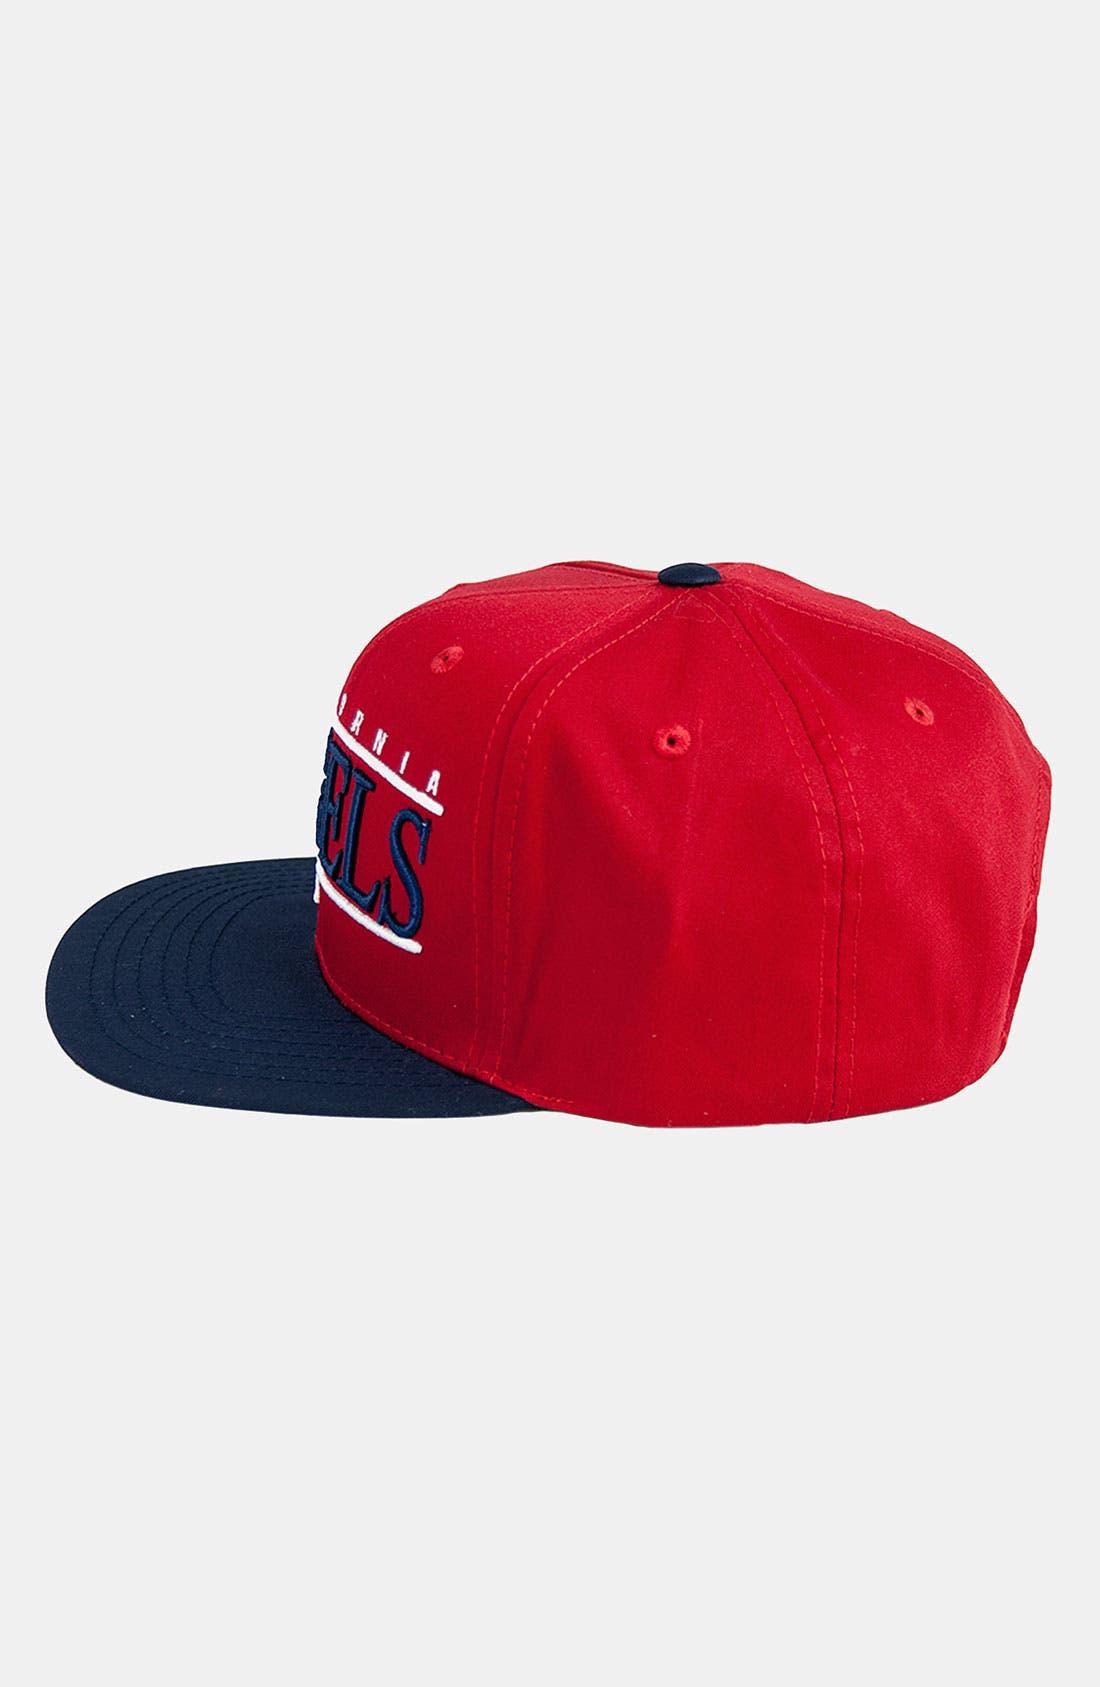 Alternate Image 3  - American Needle 'Los Angeles Angels of Anaheim - Nineties' Twill Snapback Baseball Cap